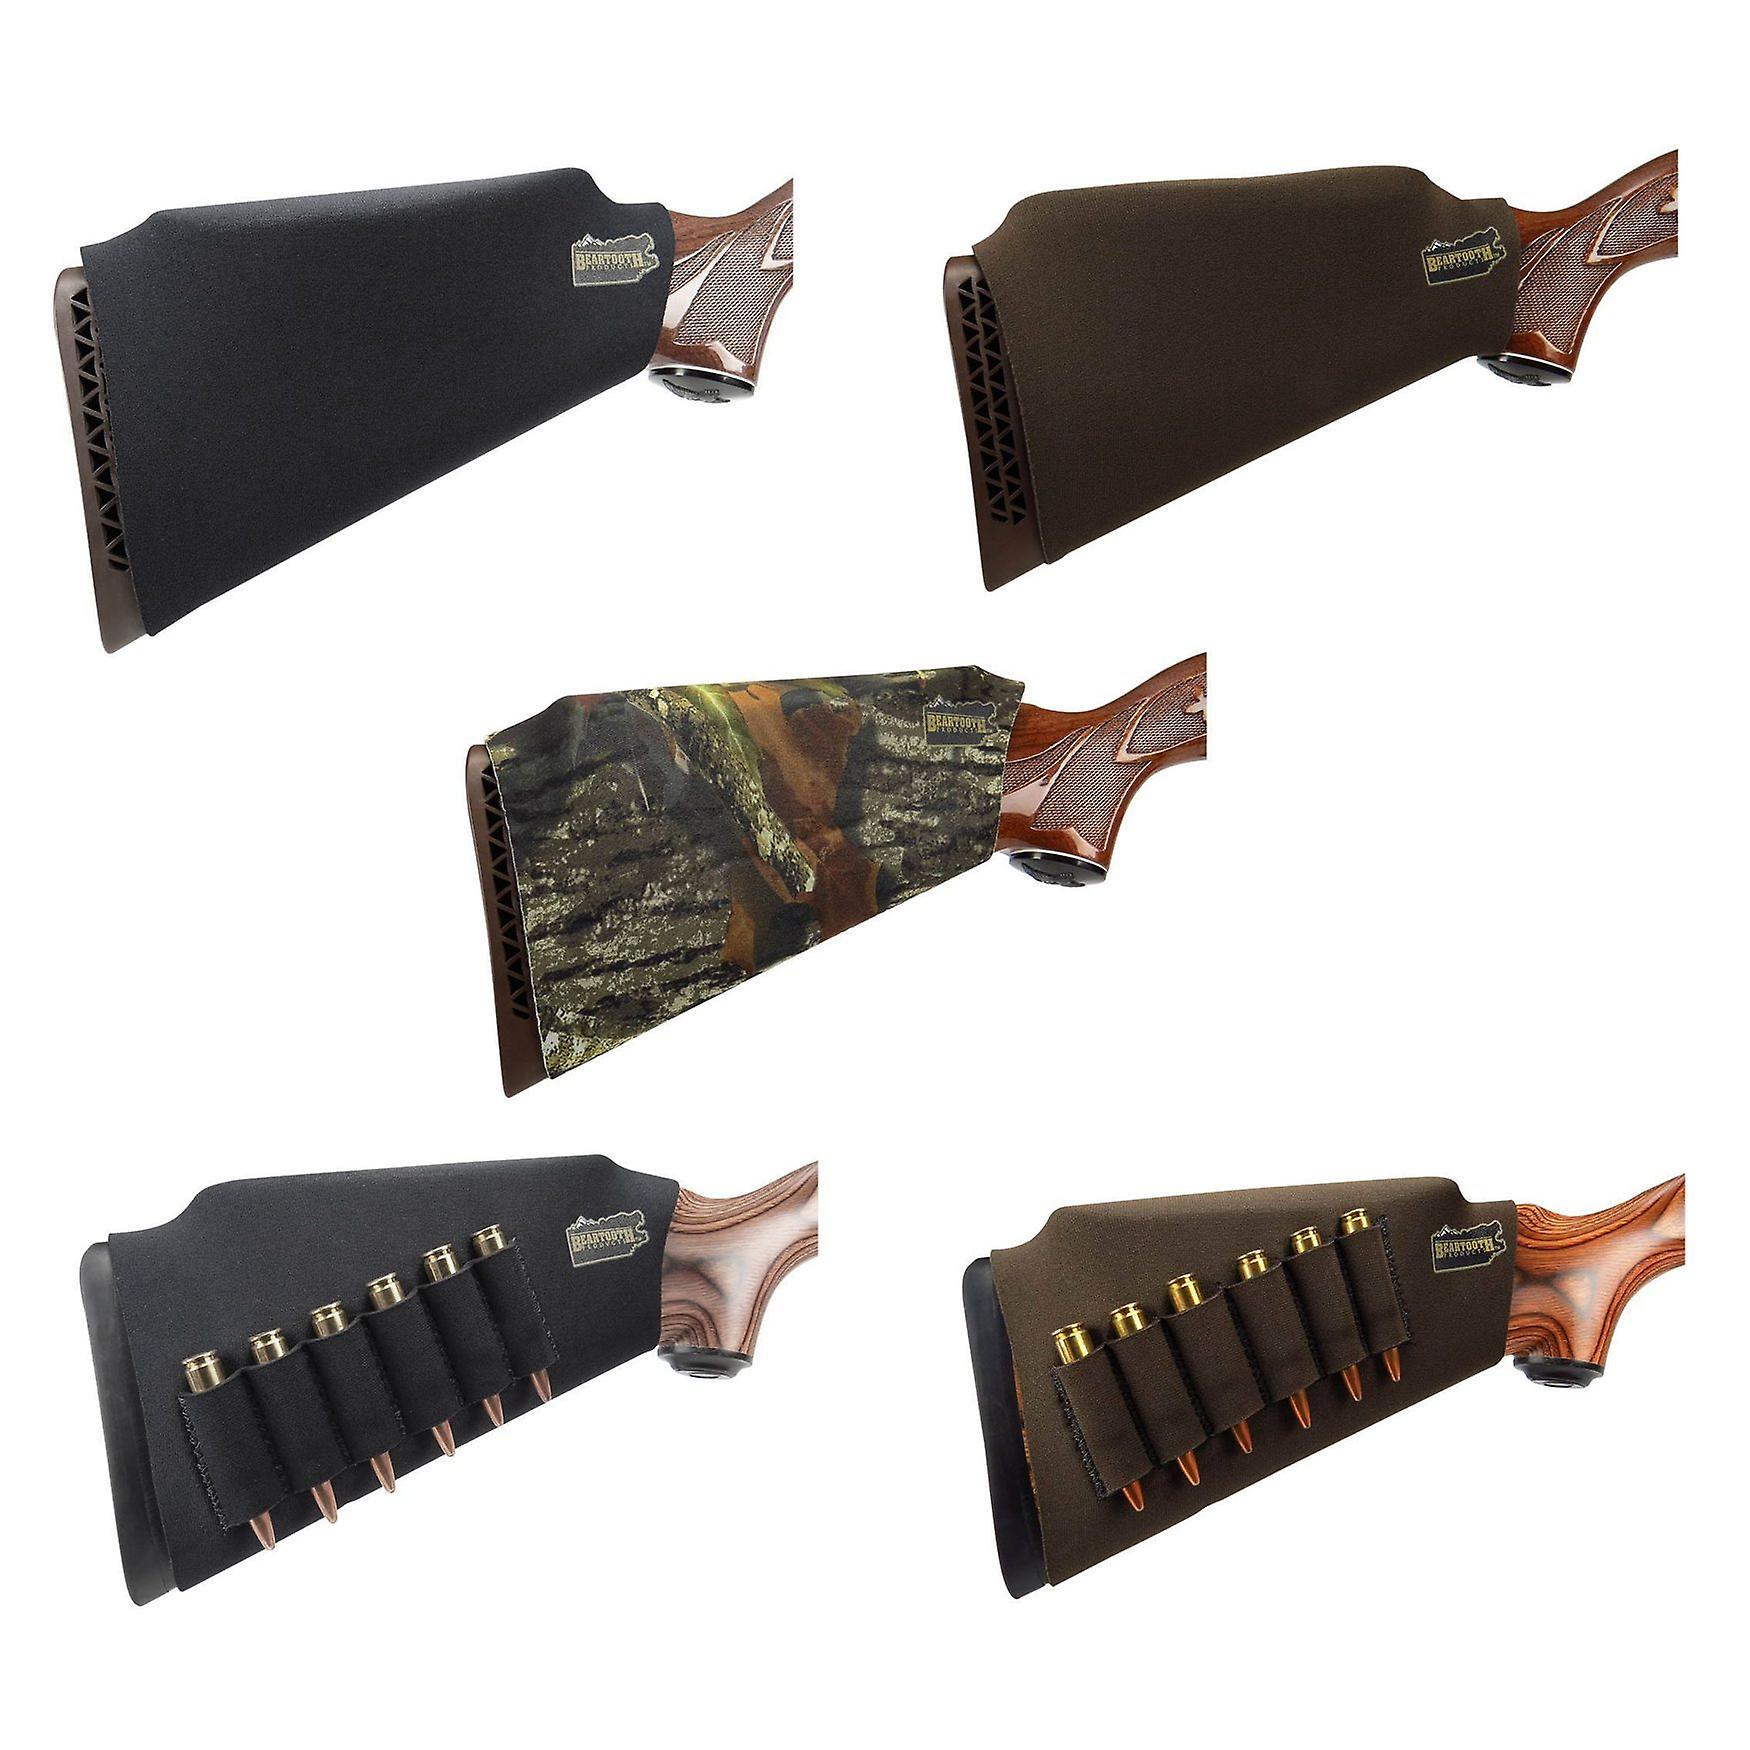 Beartooth Kamm raising Kit 2.0 - Gewehr Schrotflinte Neopren Lager Guard + Einsätze